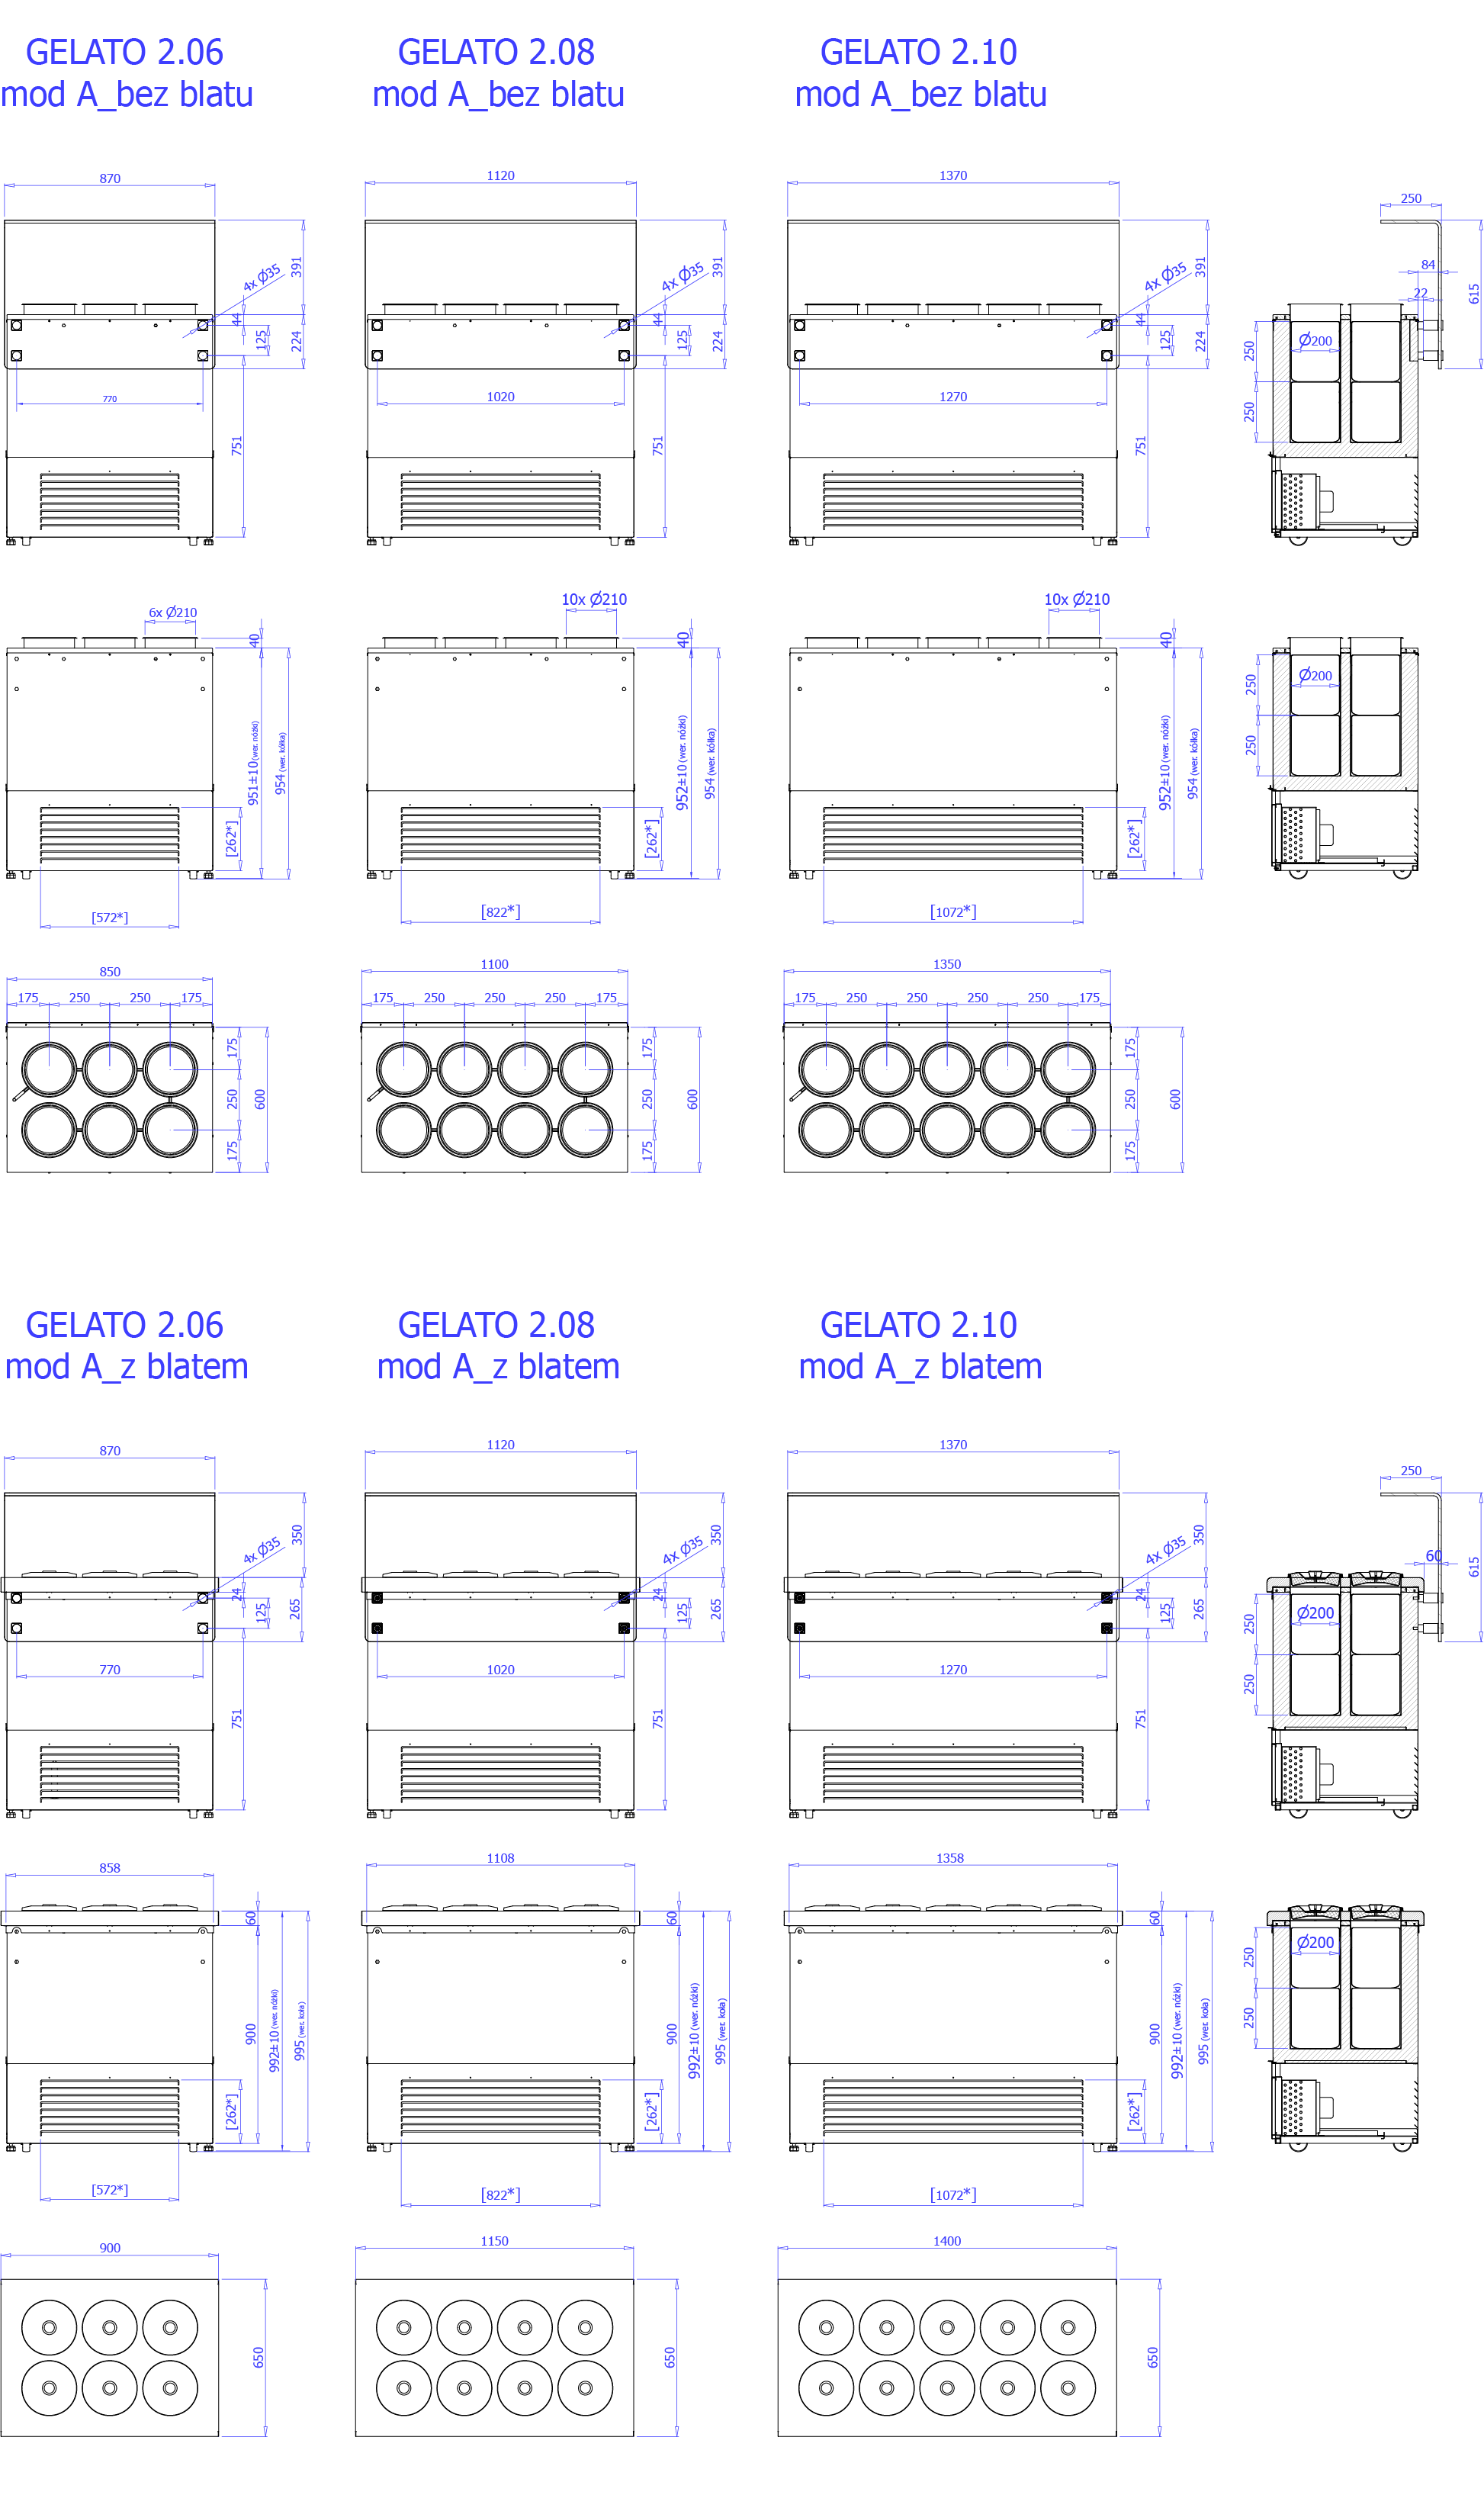 Technical drawing GELATO 2 MOD A